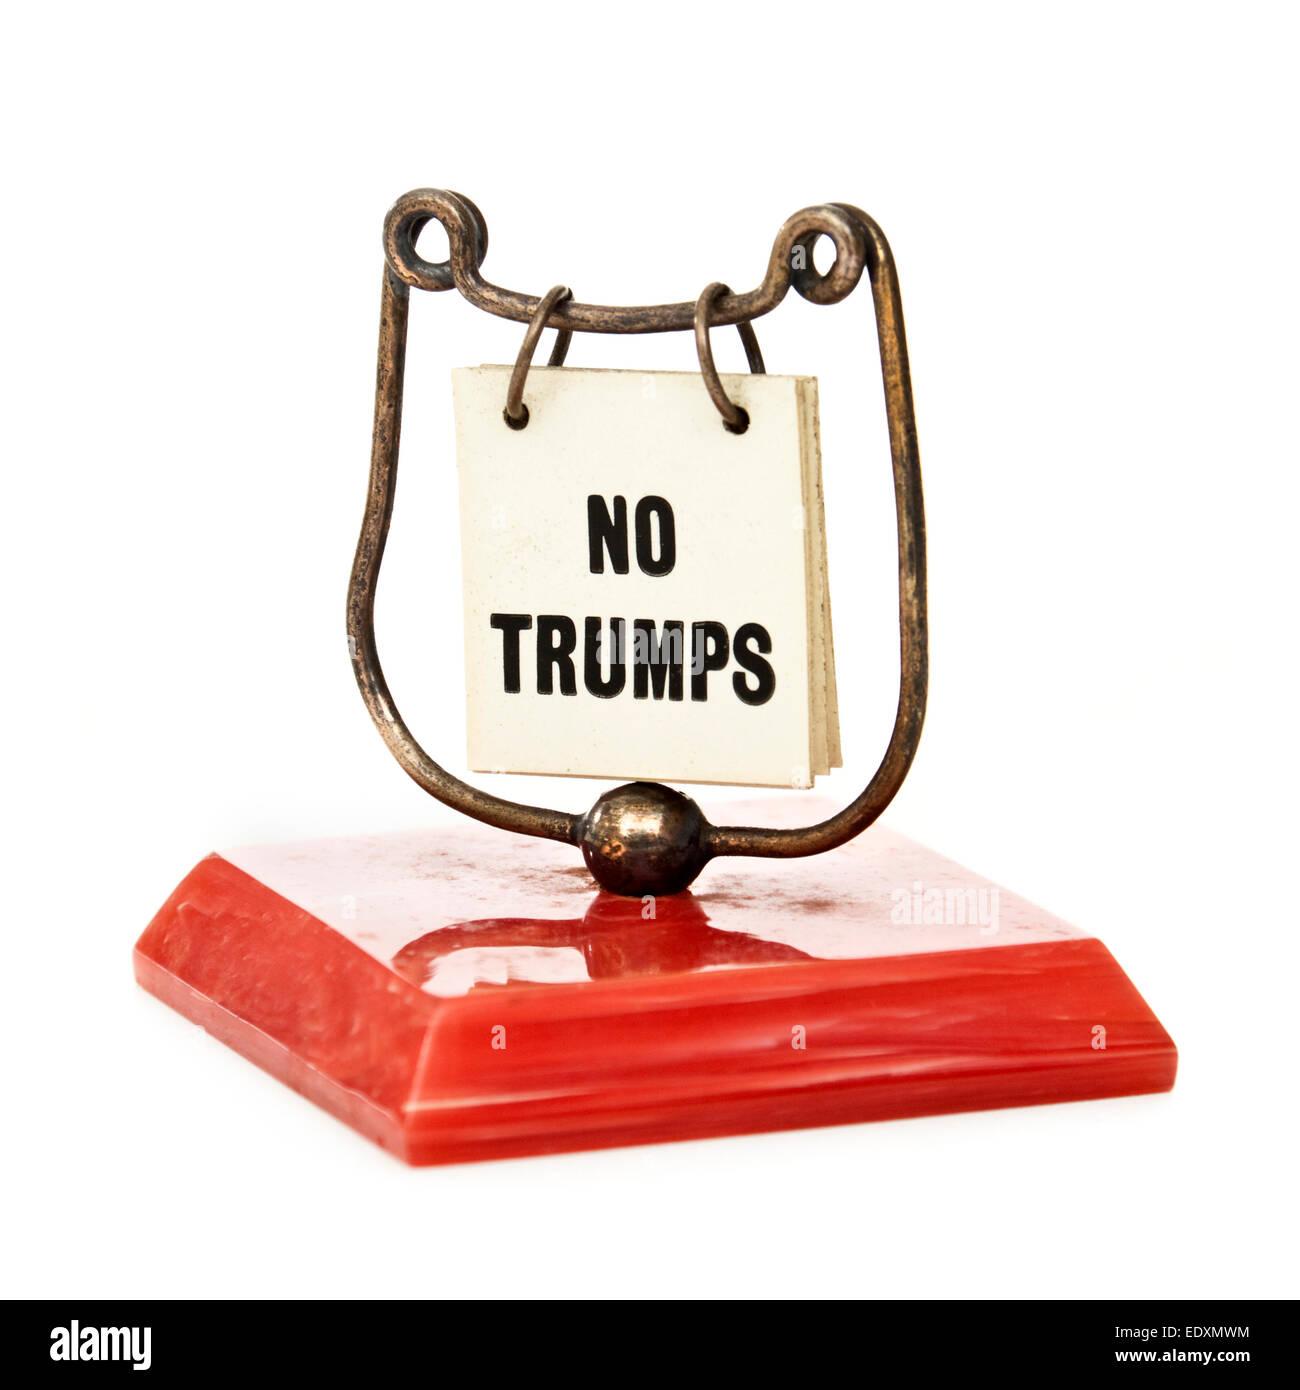 Vintage 1950's bridge trumps indicator (card game accessory), displaying 'no trumps' - Stock Image